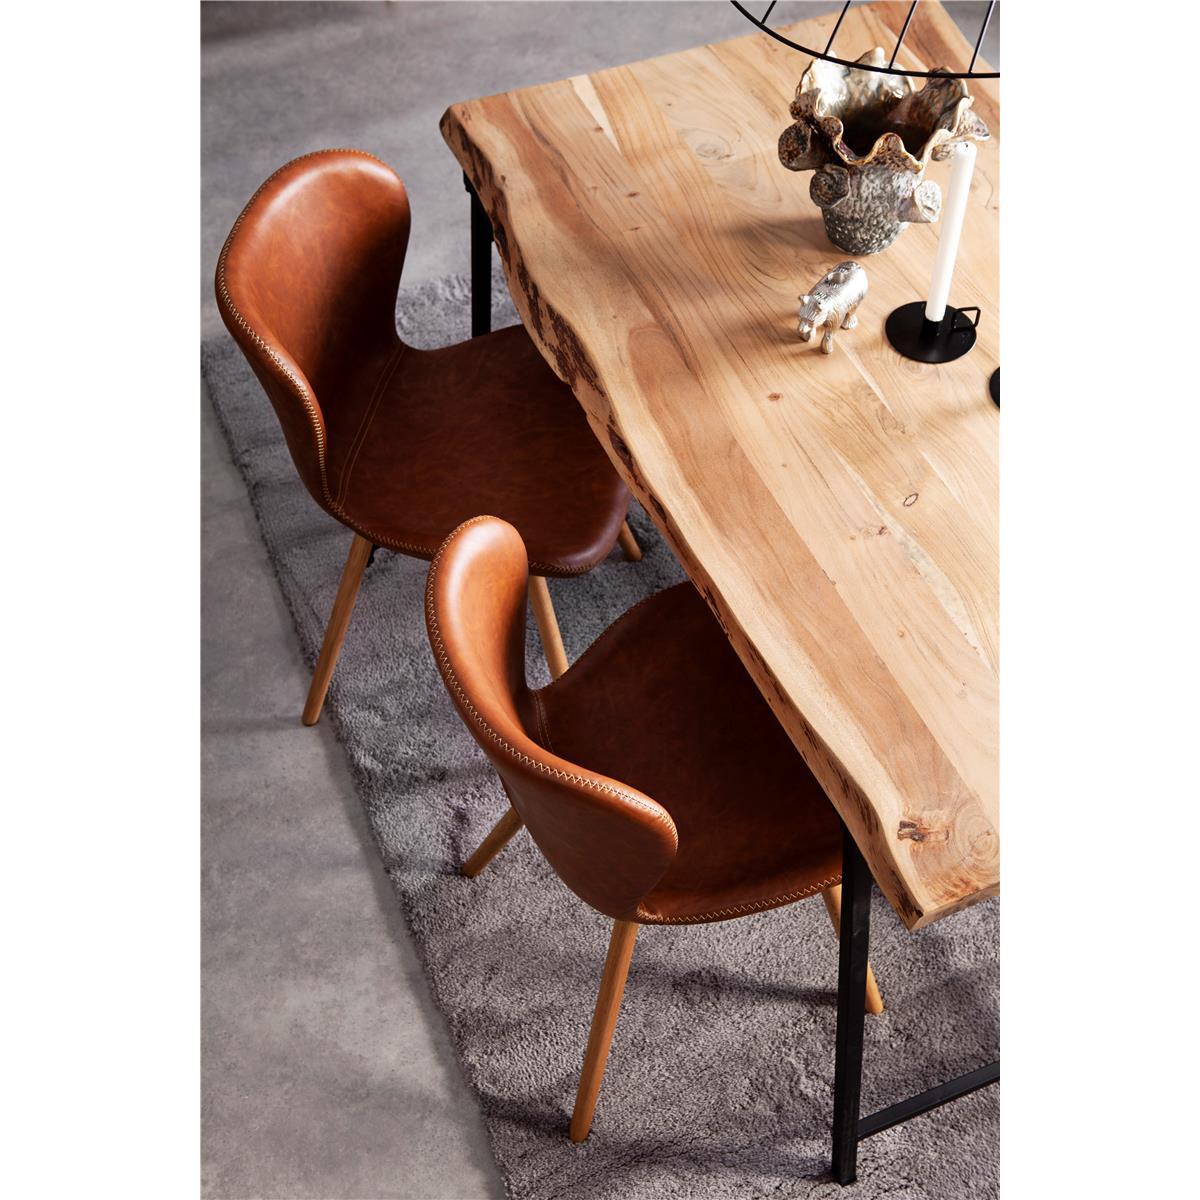 Conrad matbord 140 lotus stol cognac detalj